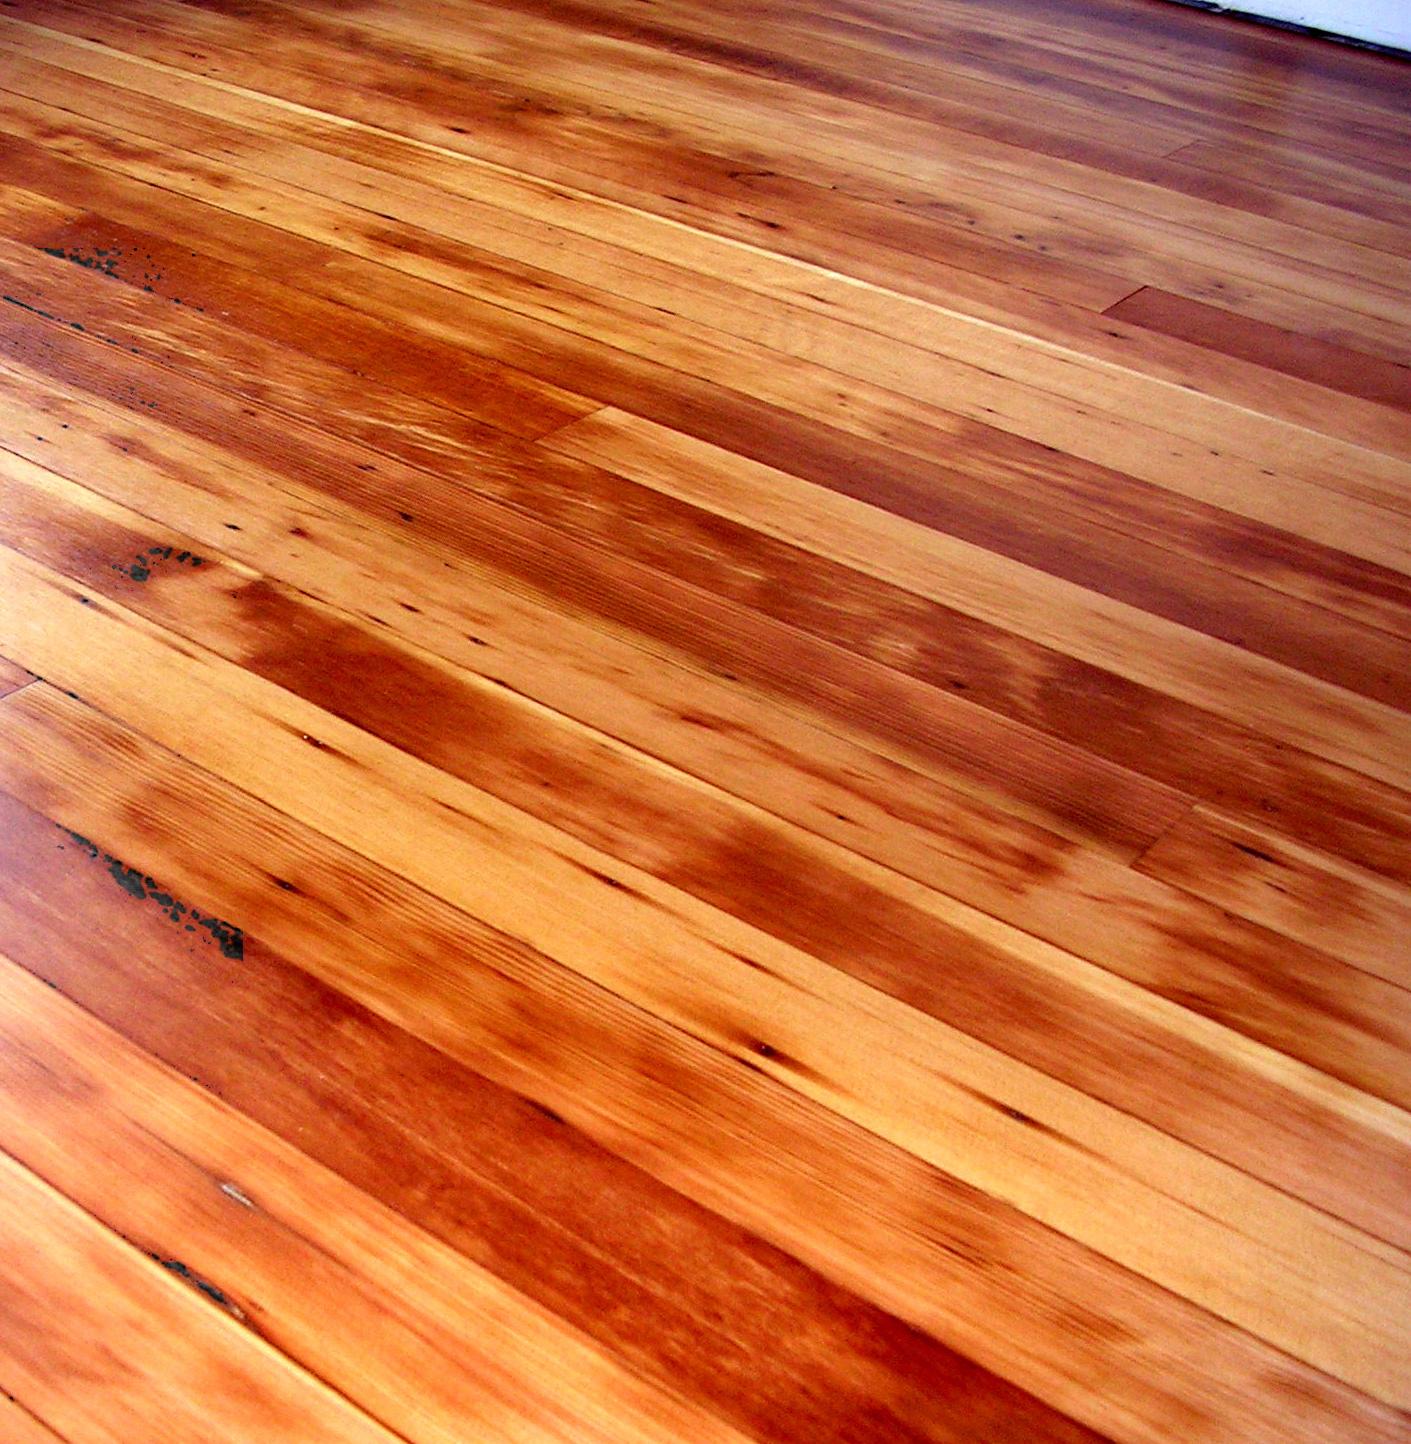 Fullsize Of Douglas Fir Flooring